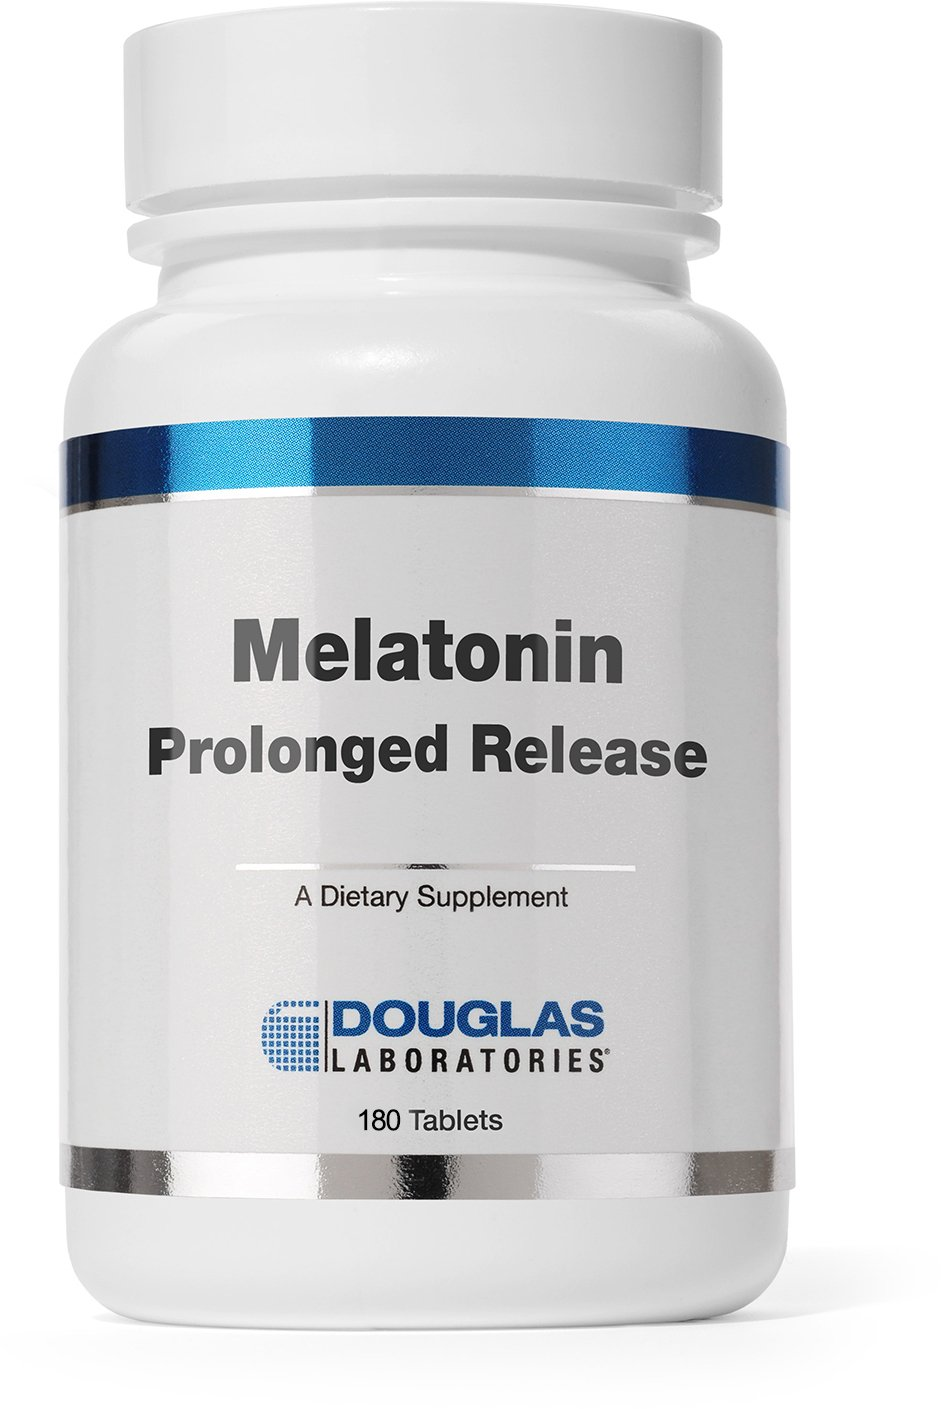 Douglas Laboratories® - Melatonin - Prolonged Release Supports Sleep/Wake Cycles* (3 mg.) - 180 Tablets